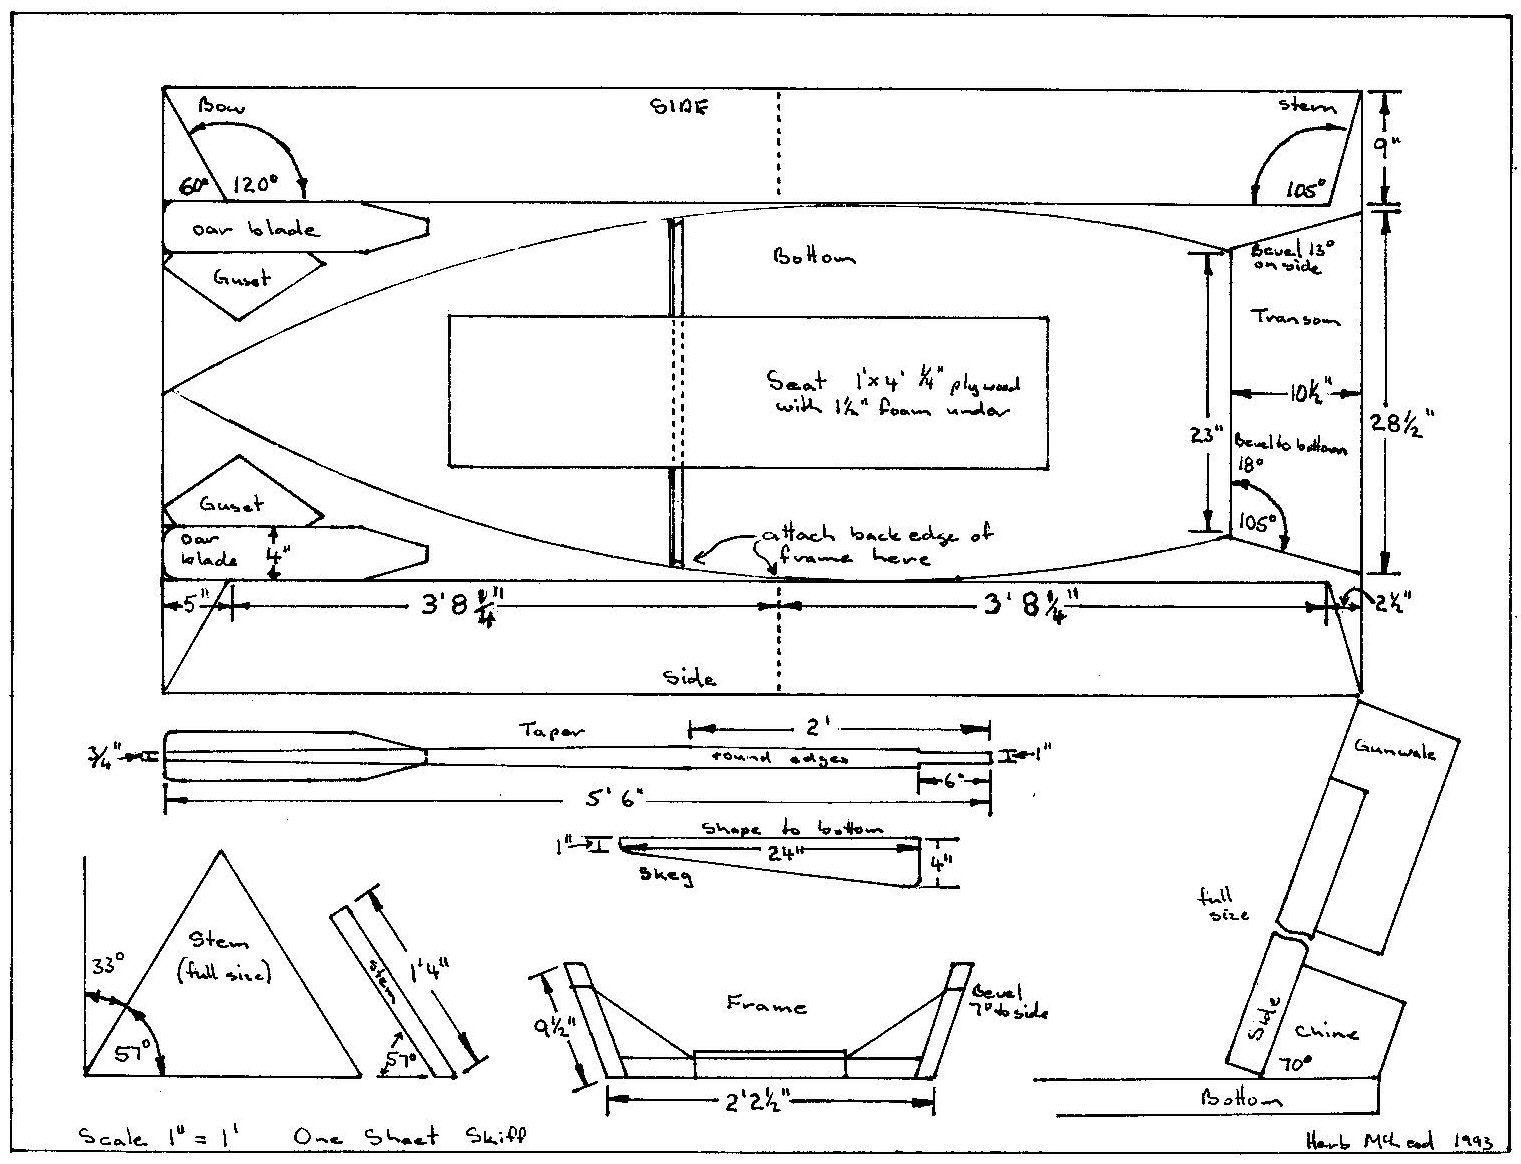 1 Sheet Skiff Plan Boat Plans Wooden Boat Plans Boat Building